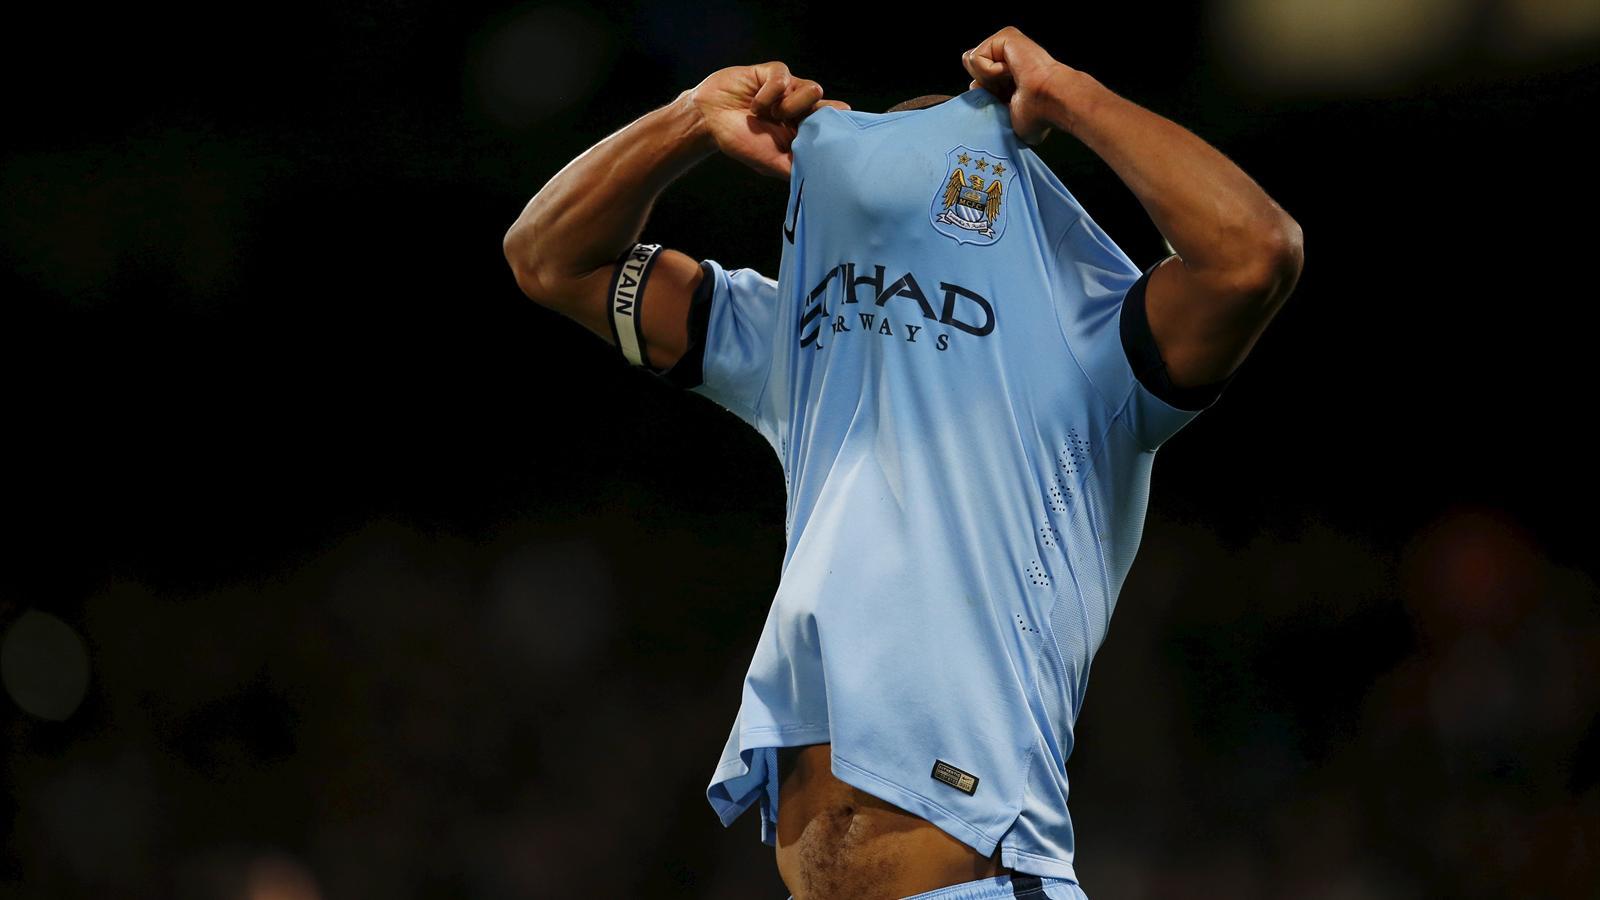 Manchester City's Vincent Kompany looks dejected